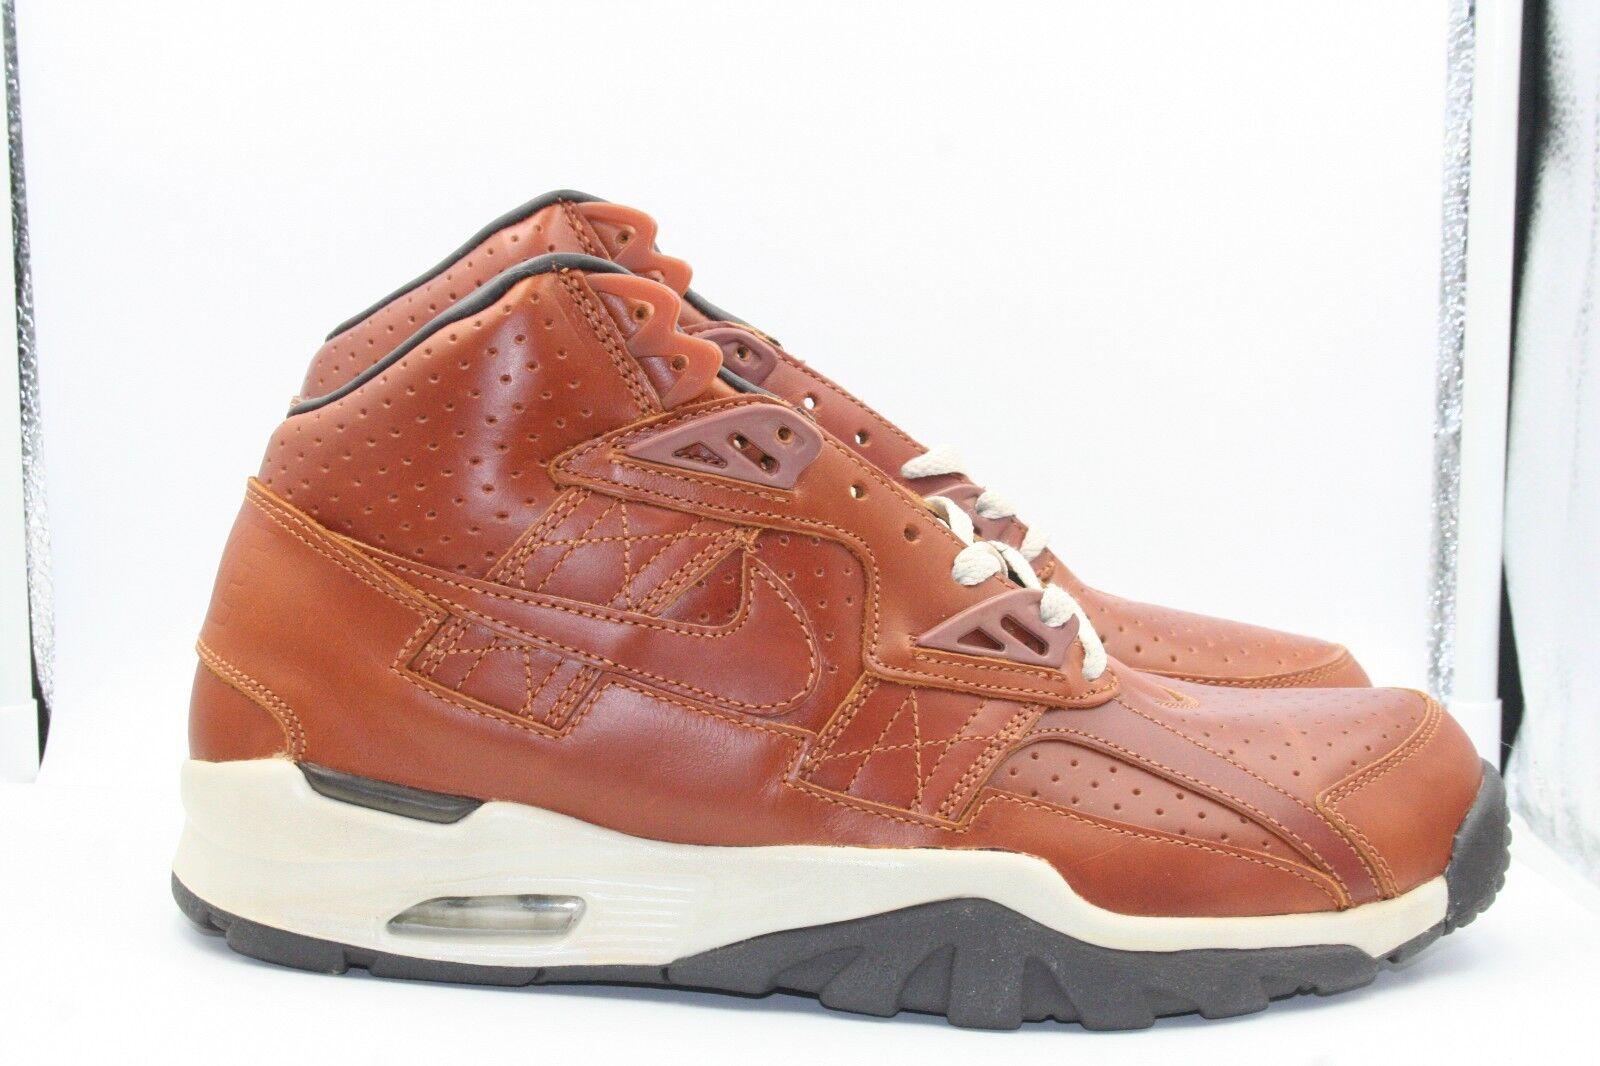 Nike Air Trainer SC Premium + High Sz 11 Medium Curry Dark Brown Net Bo Jackson